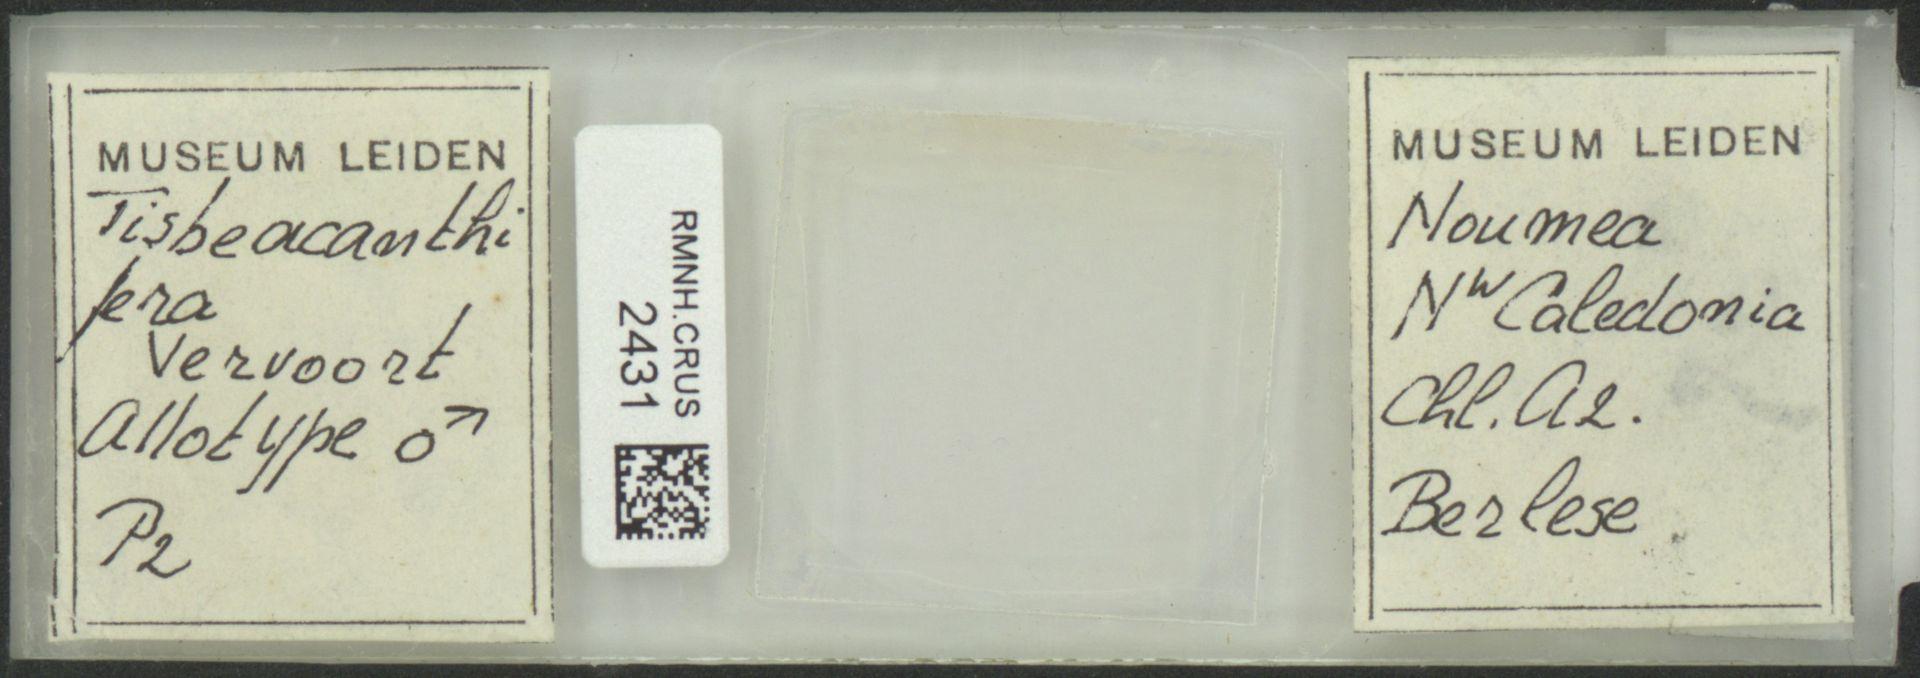 RMNH.CRUS.2431 | Tisbe acanthifera Vervoort, 1962